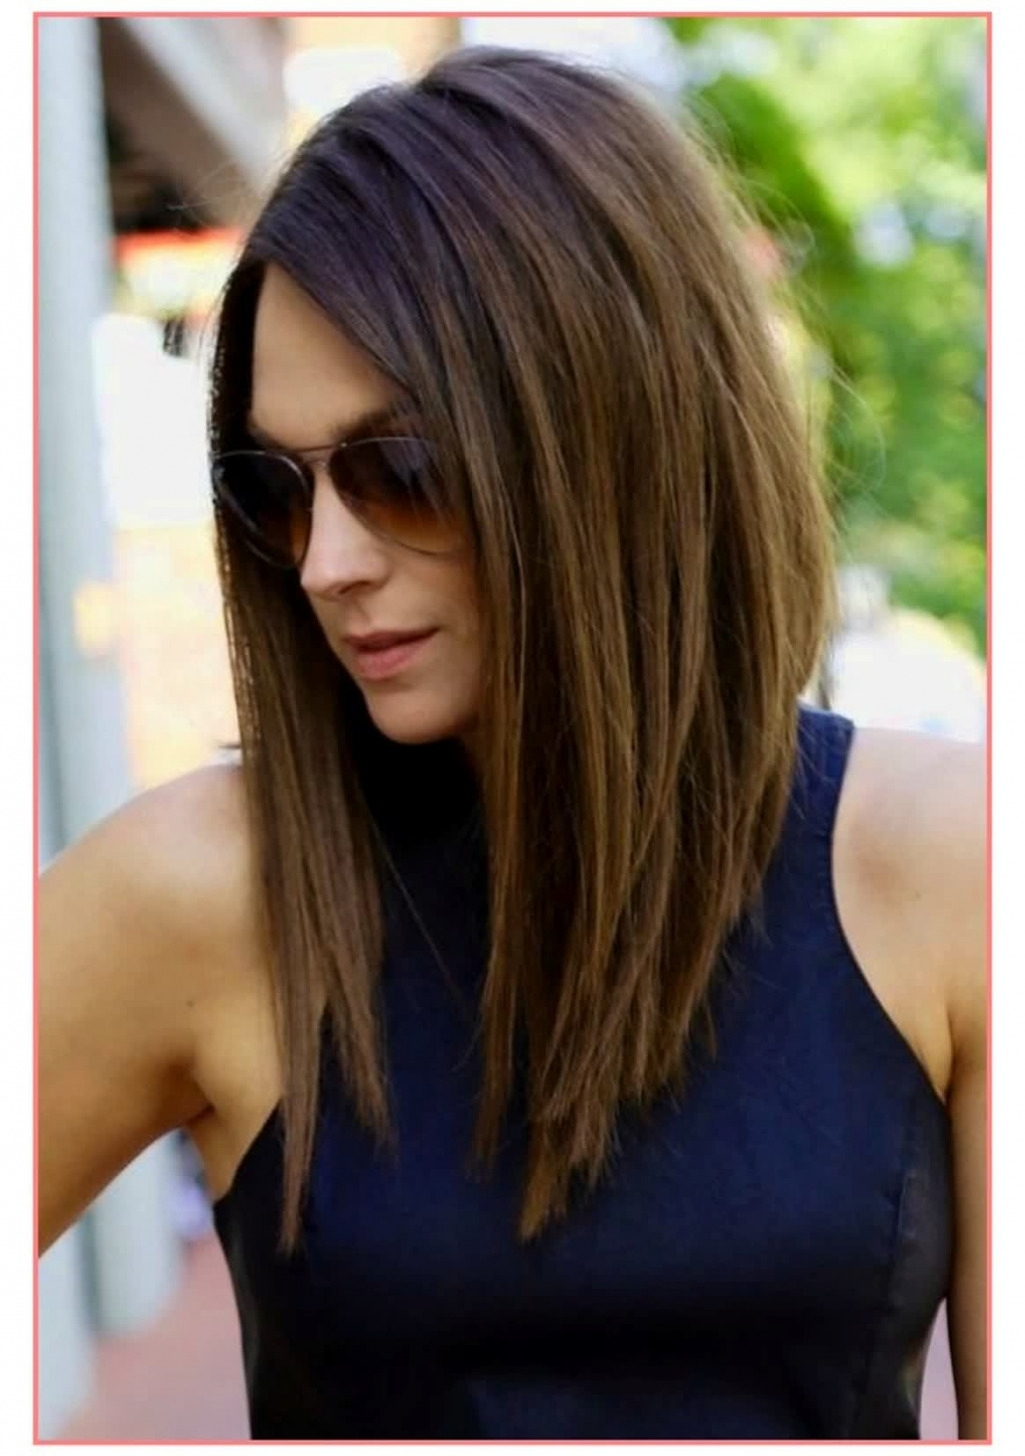 Haircuts 2018 Female Shoulder Length Wavy Haircut